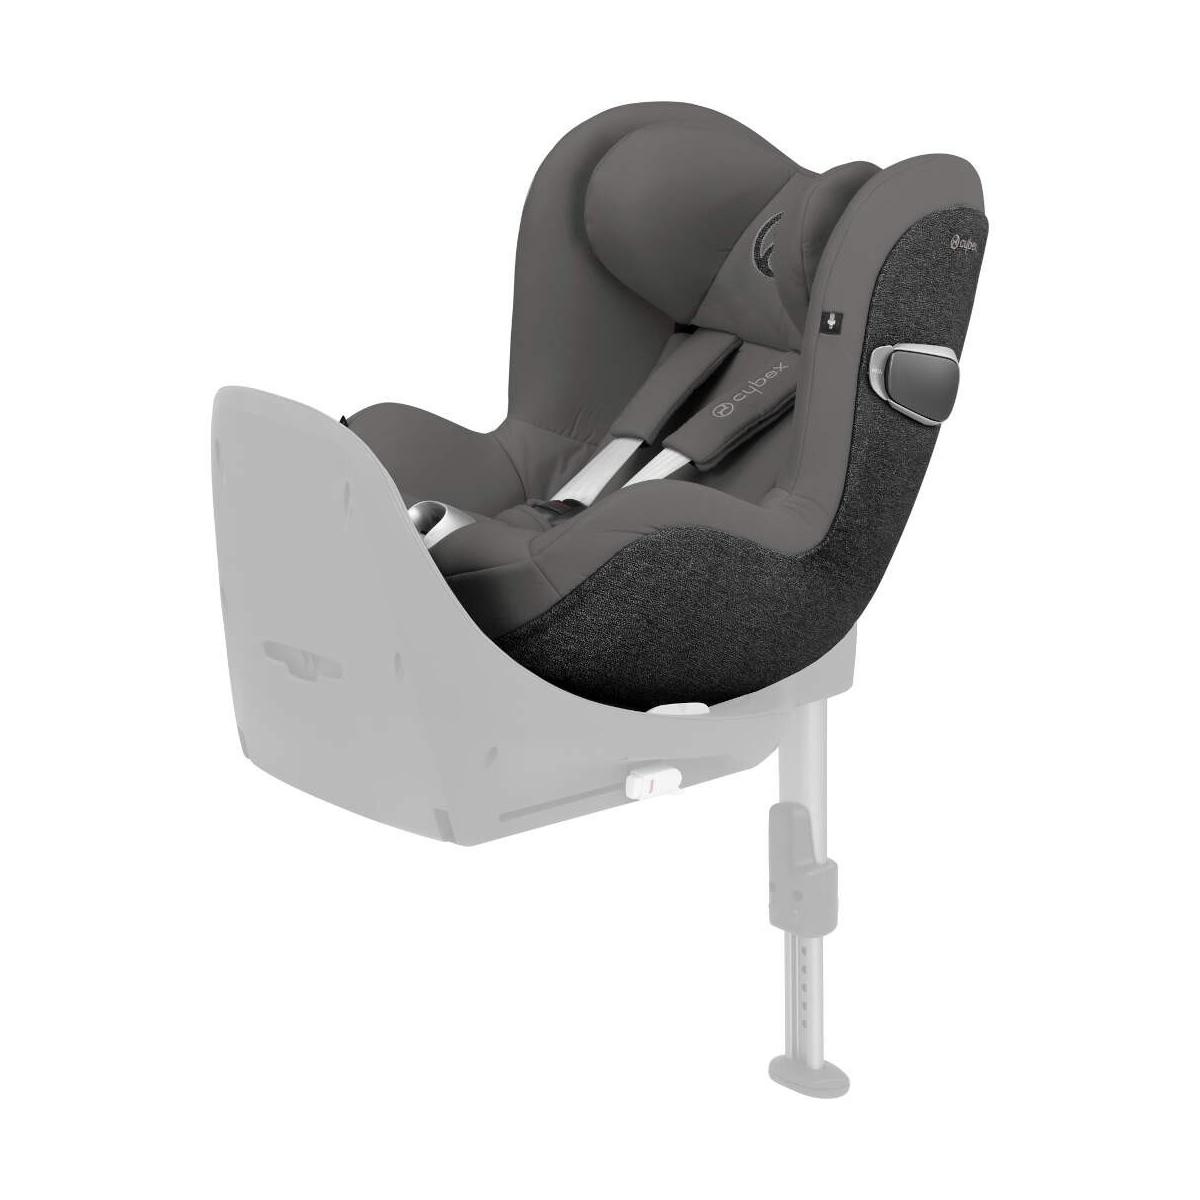 Cybex Sirona Z i-Size Group 0+/1 Car Seat-Soho Grey (2021)